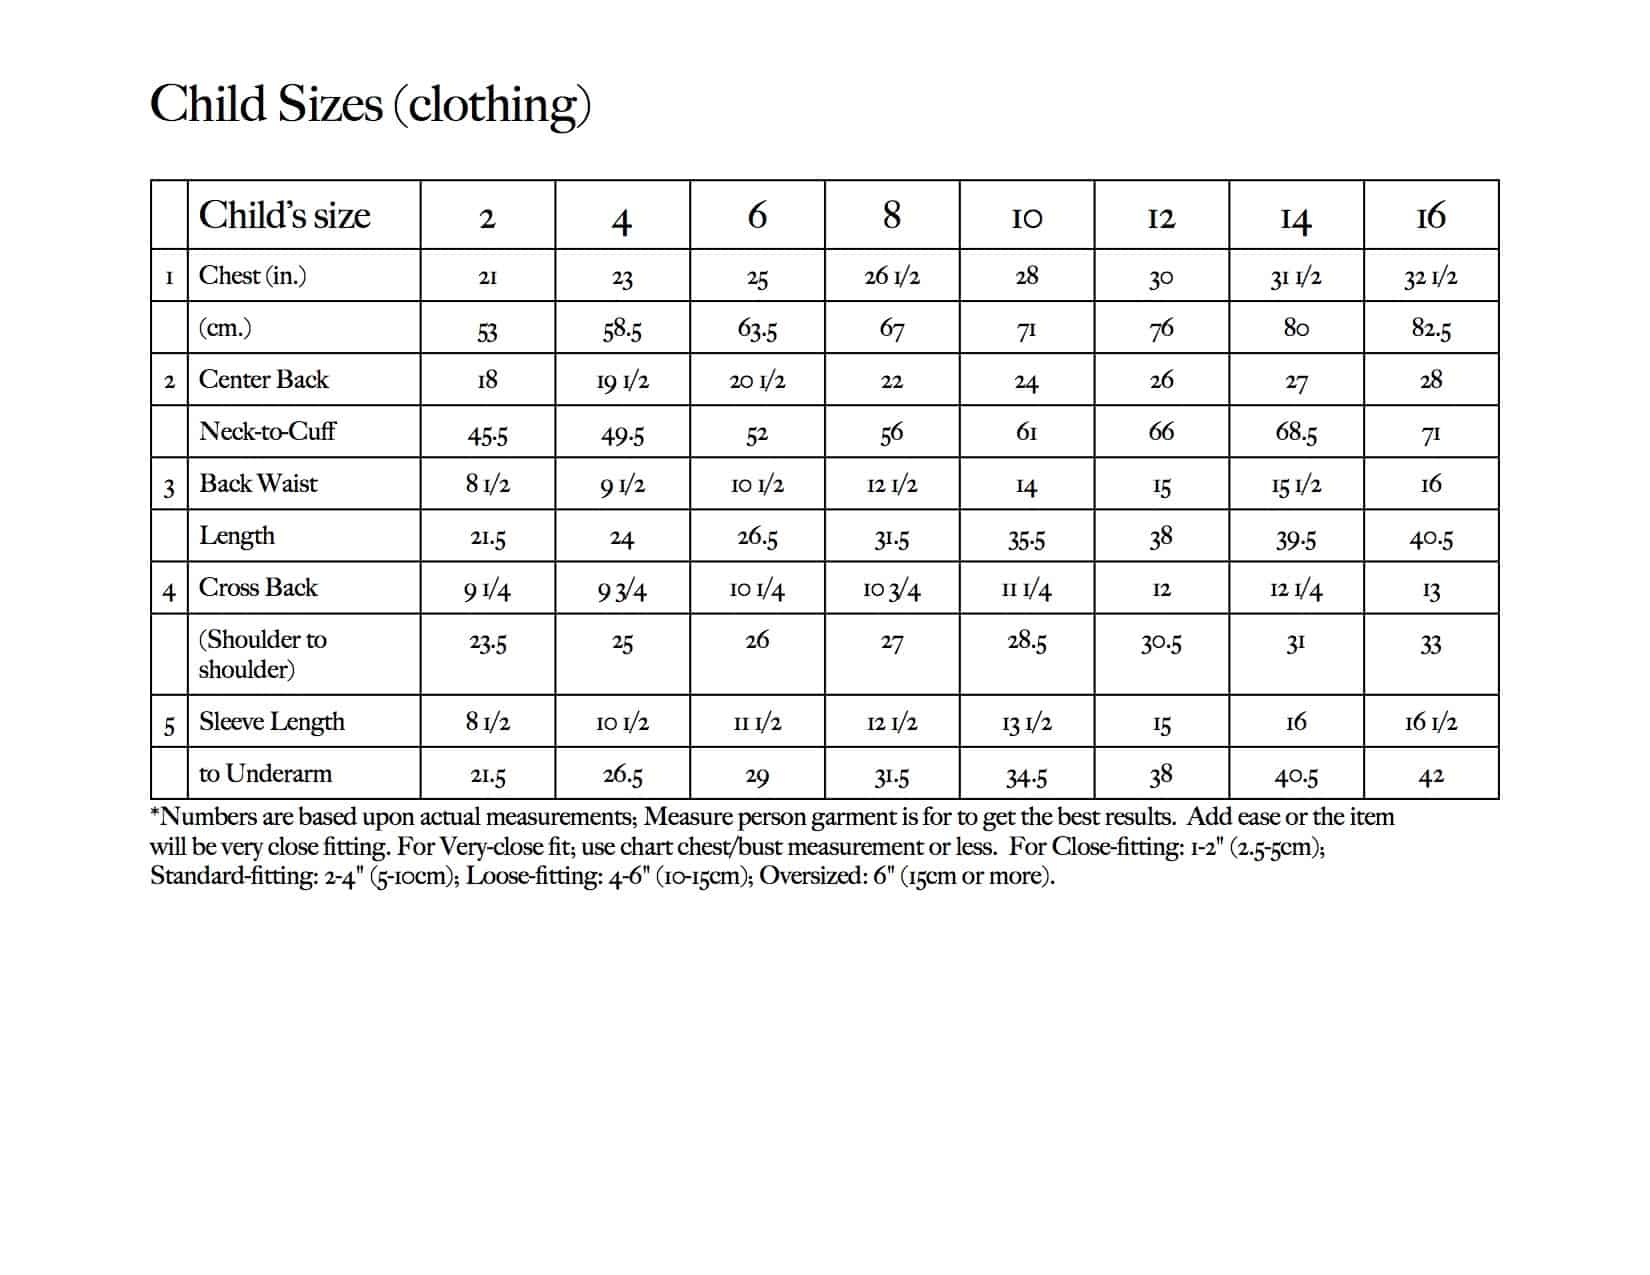 Child sizes goodknit kisses child sizes chart by kristen mangus at goodknit kisses nvjuhfo Image collections